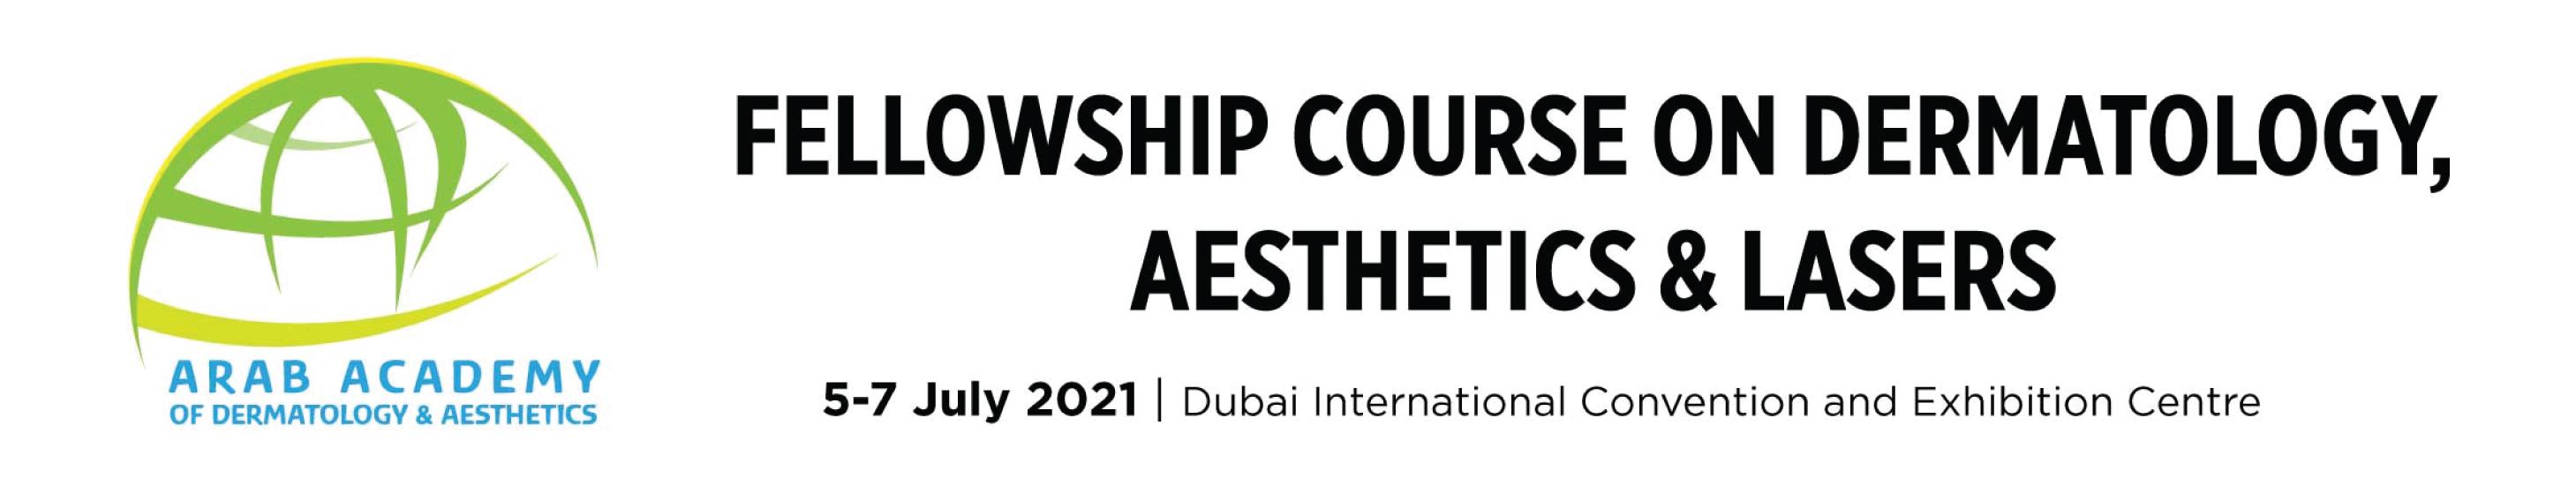 Fellowship Course on Dermatology, Aesthetics and Laser